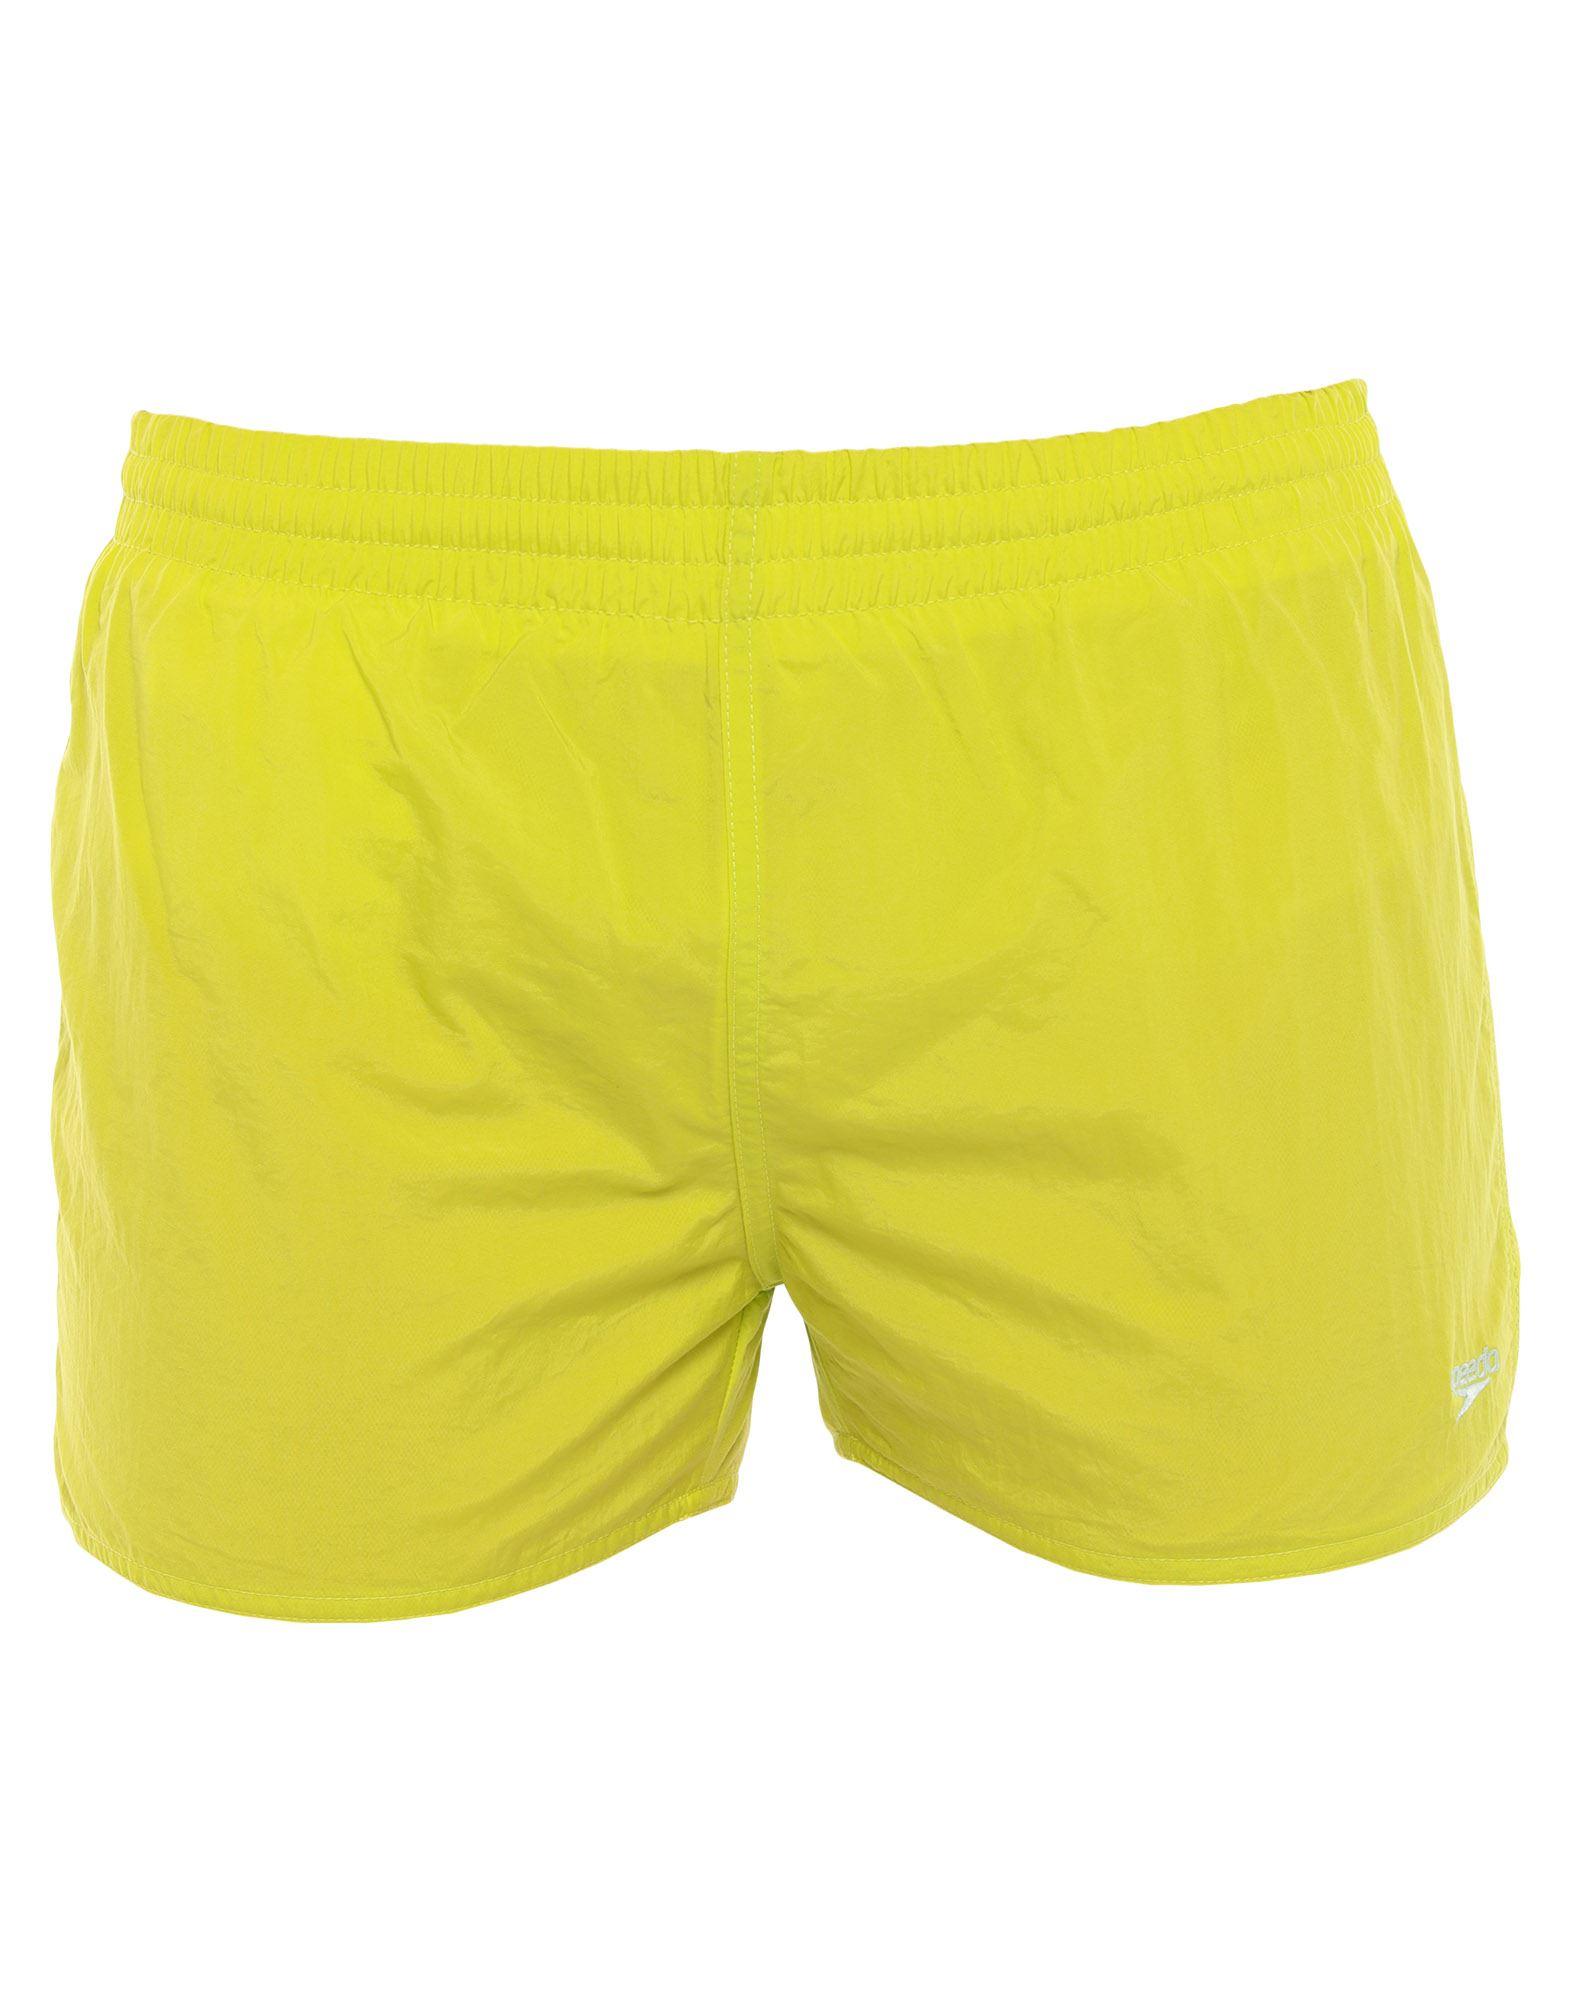 SPEEDO Шорты для плавания speedo плавки шорты для мальчиков speedo размер 140